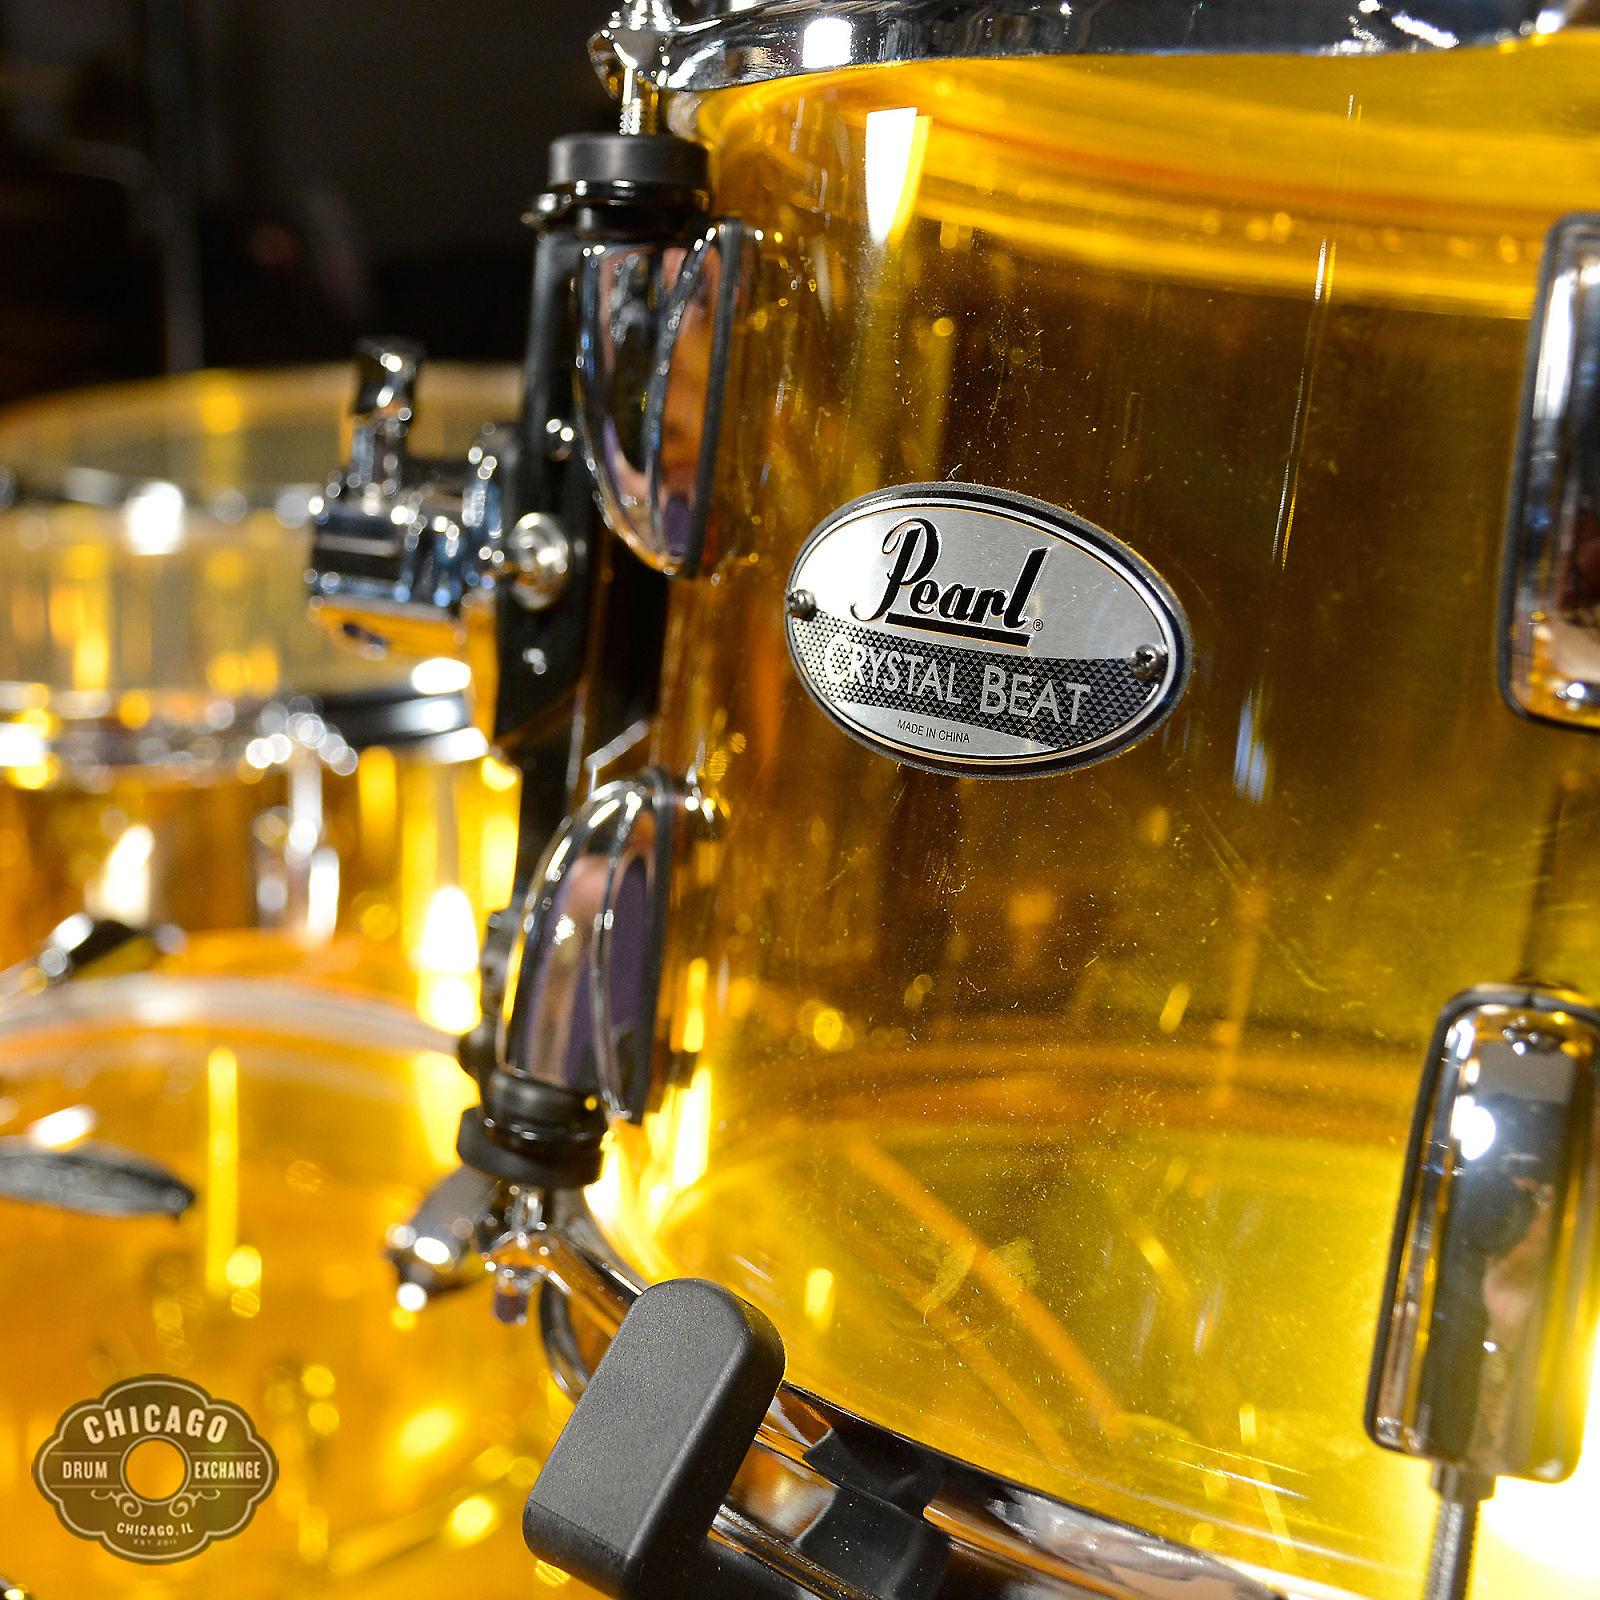 Pearl Crystal Beat 12 14 16 22 Seamless Acrylic 4pc Drum Kit